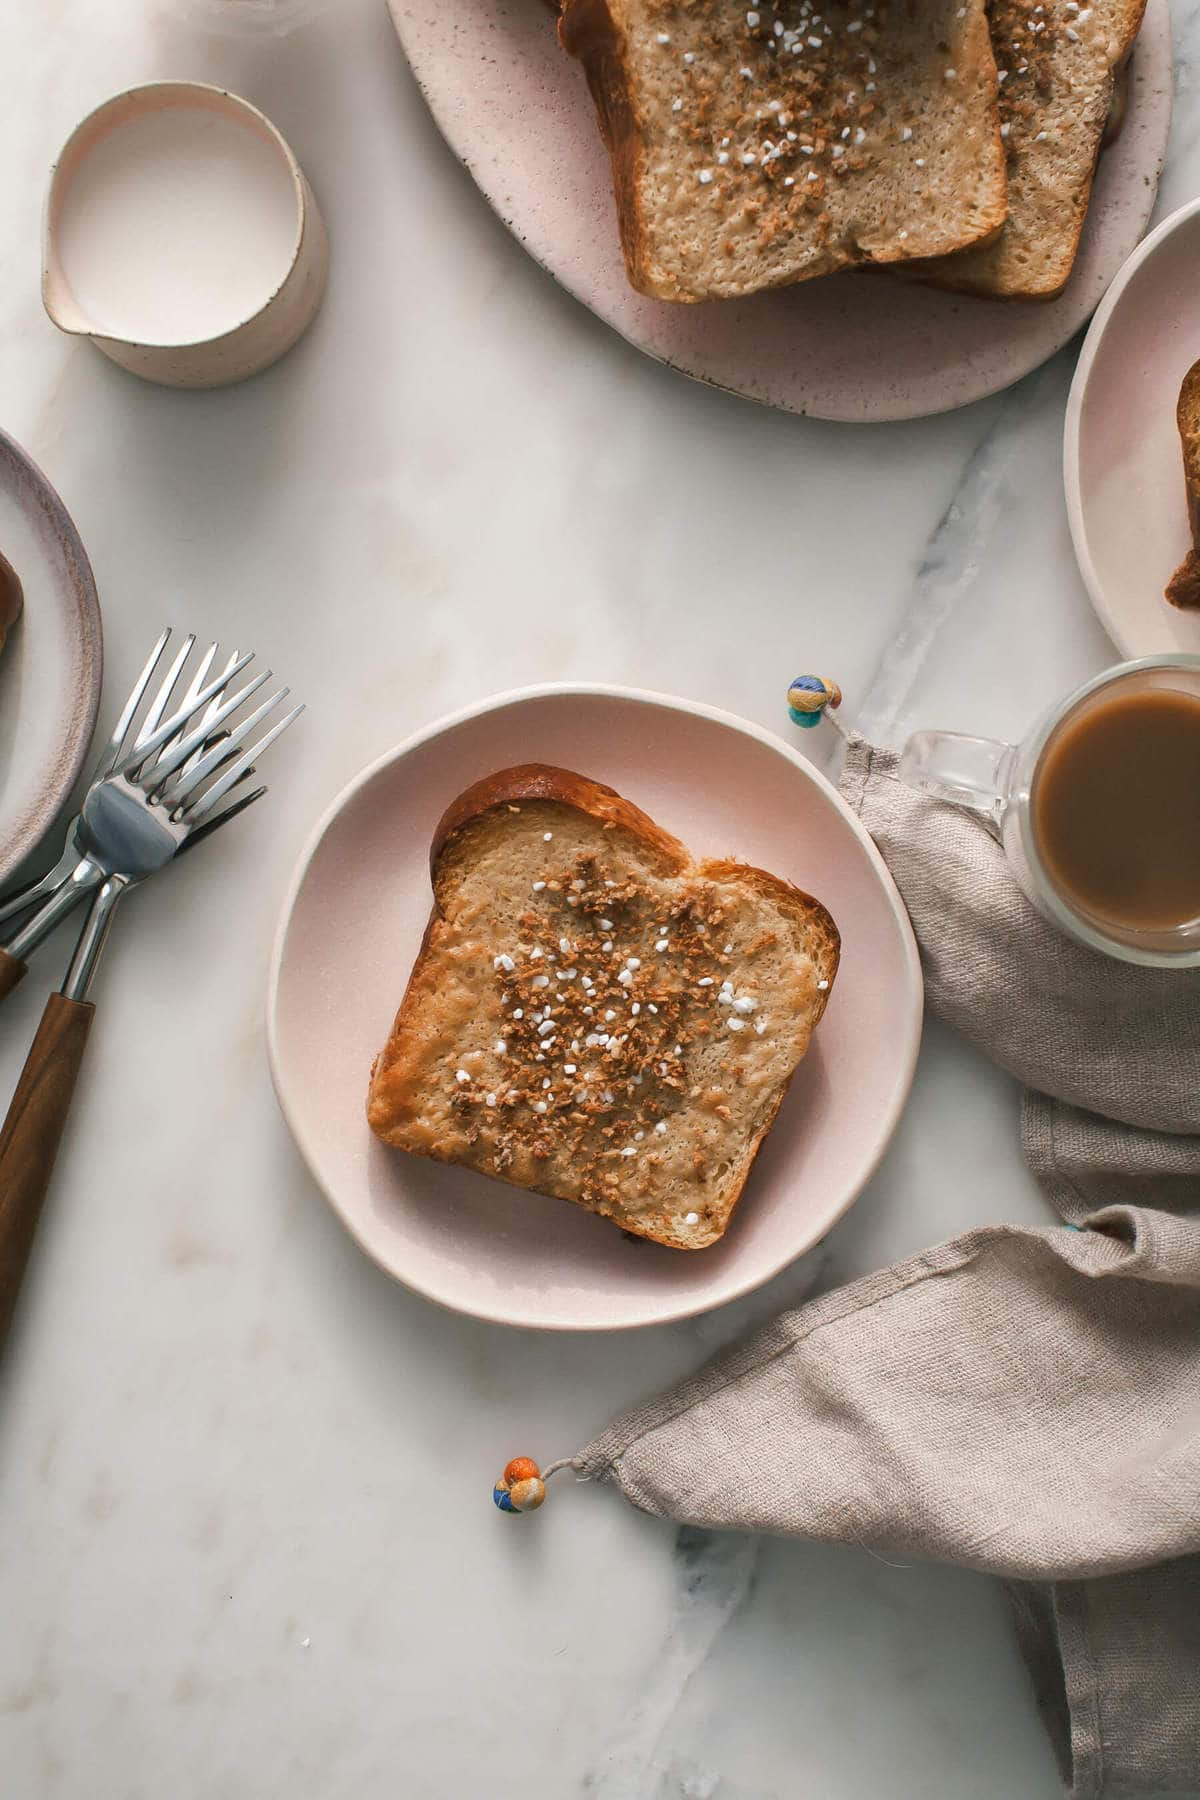 Big-Ass Cinnamon Toast Crunch